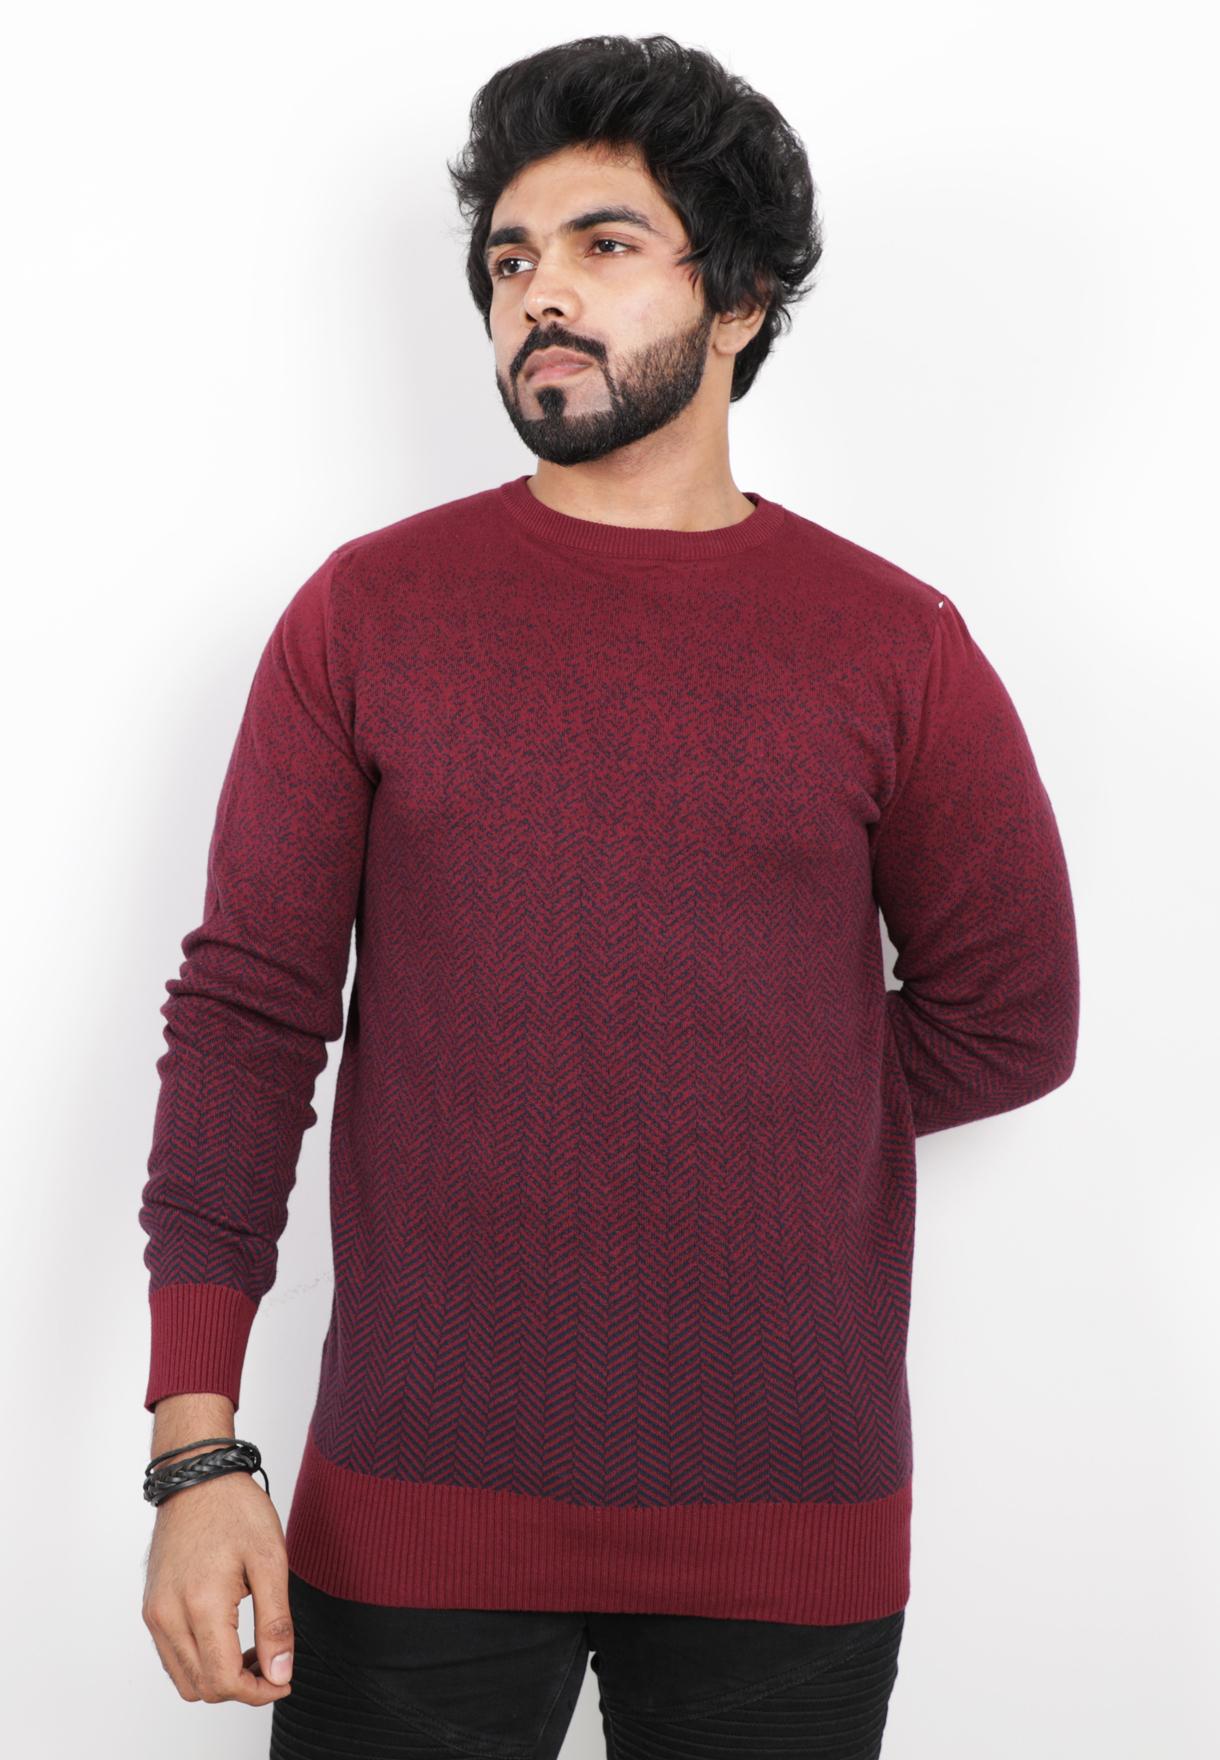 Score Jeans Mens Sweater Full Sleev Red - HF585 - M